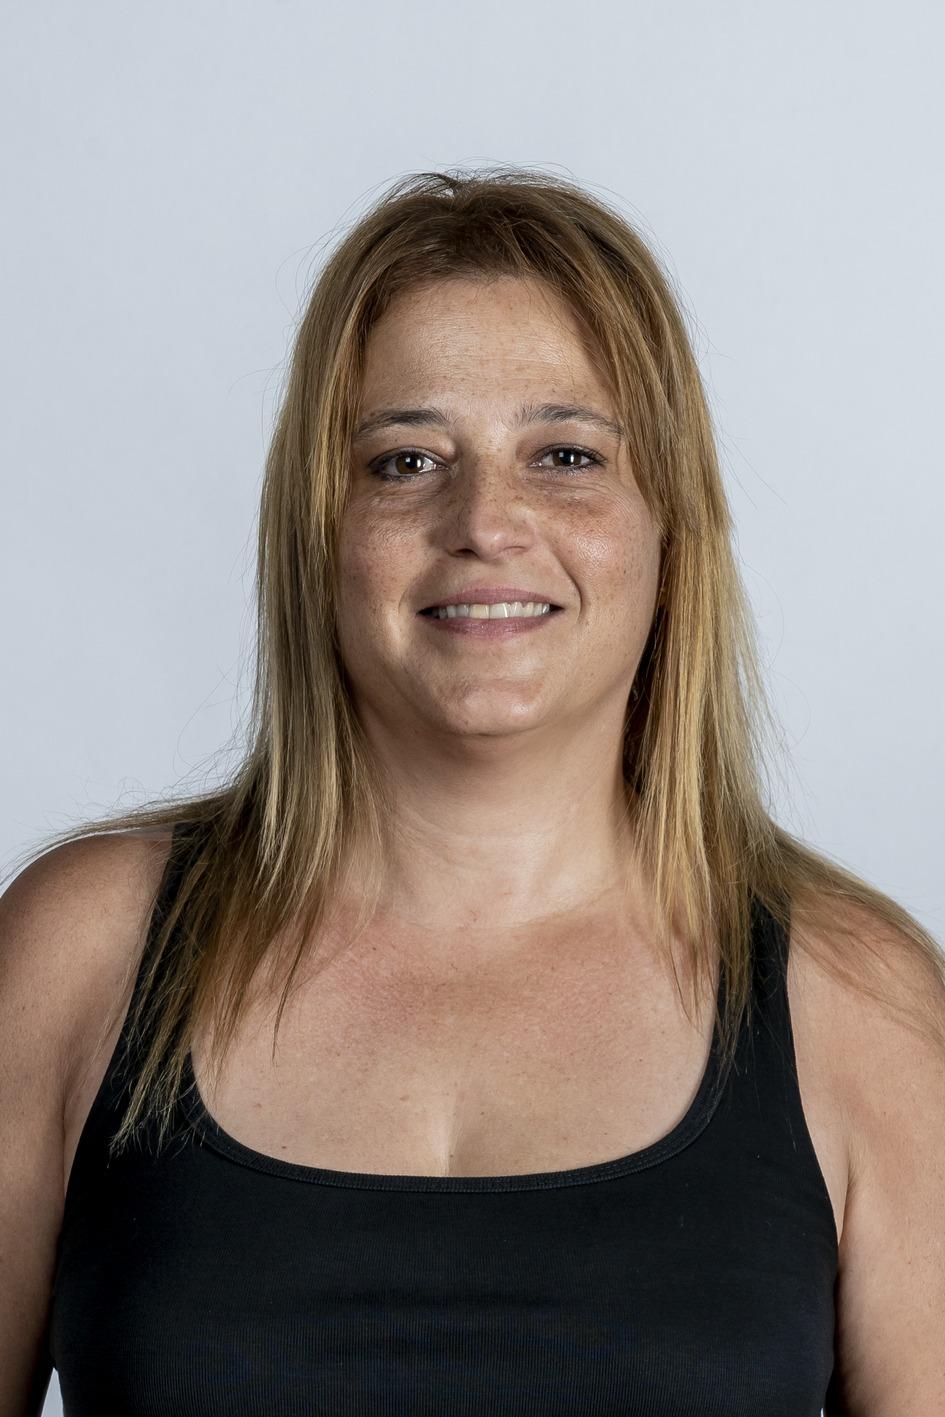 Pilar Domech Gargallo